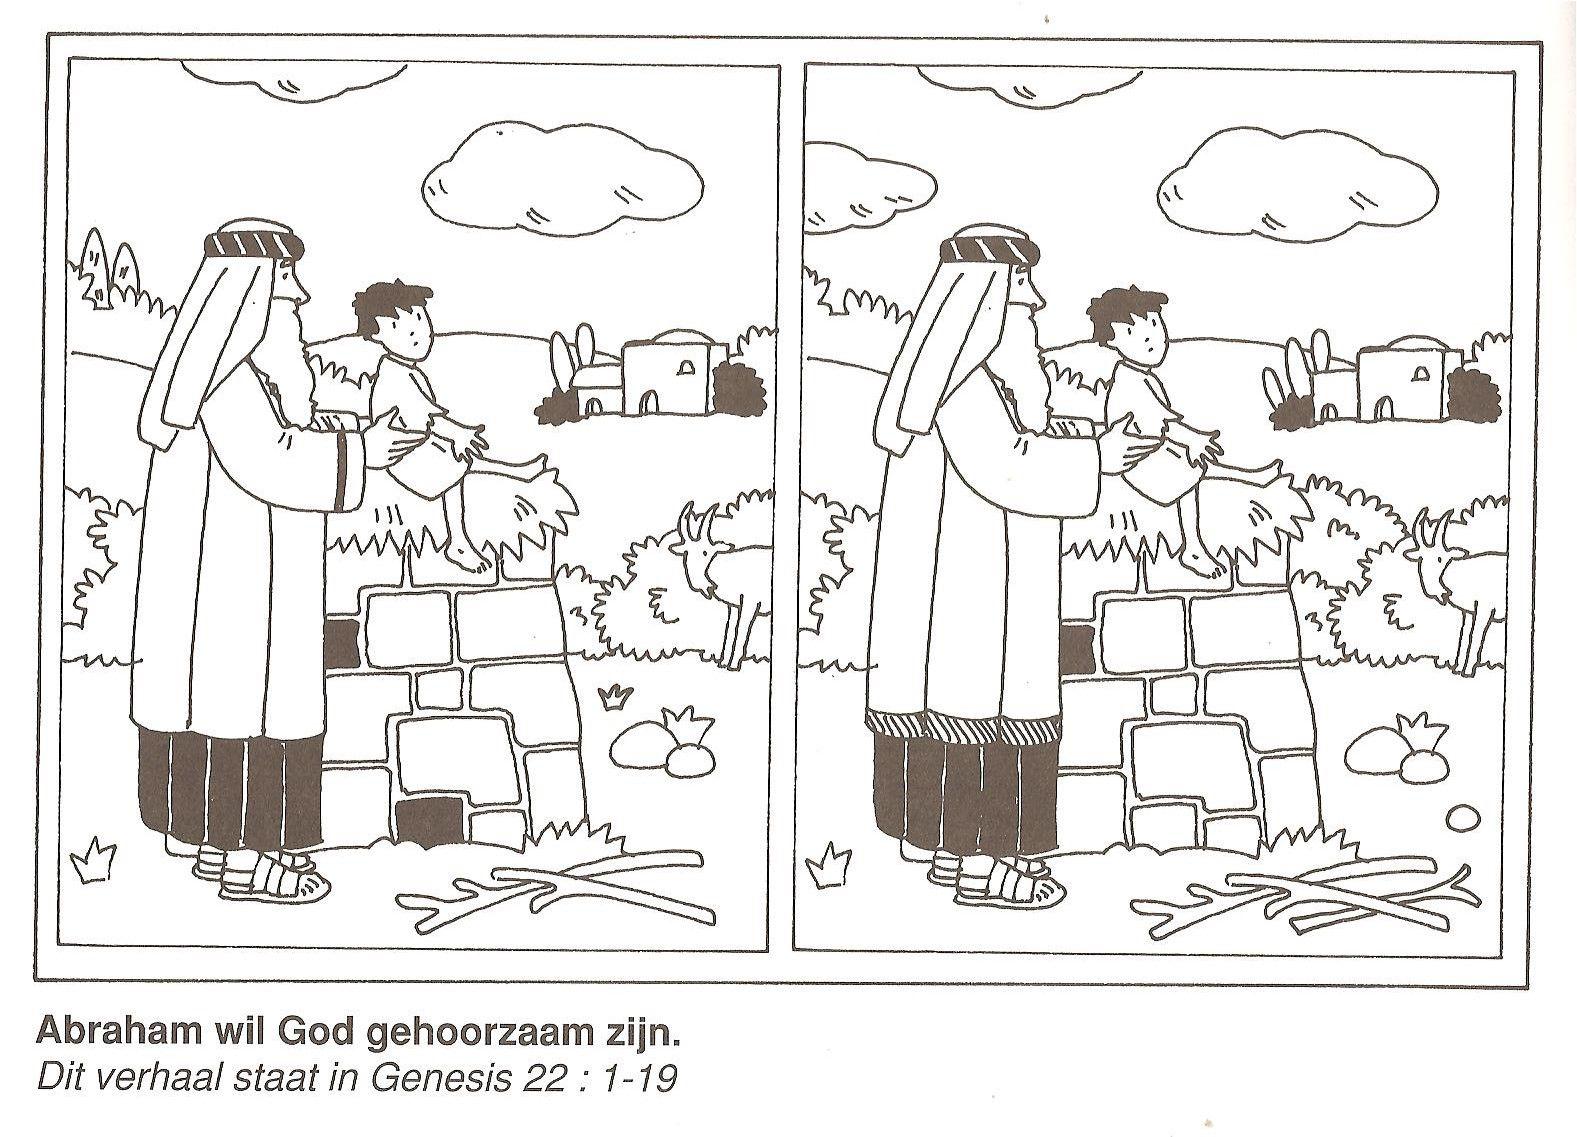 medium resolution of Abraham wil God gehoorzaam zijn